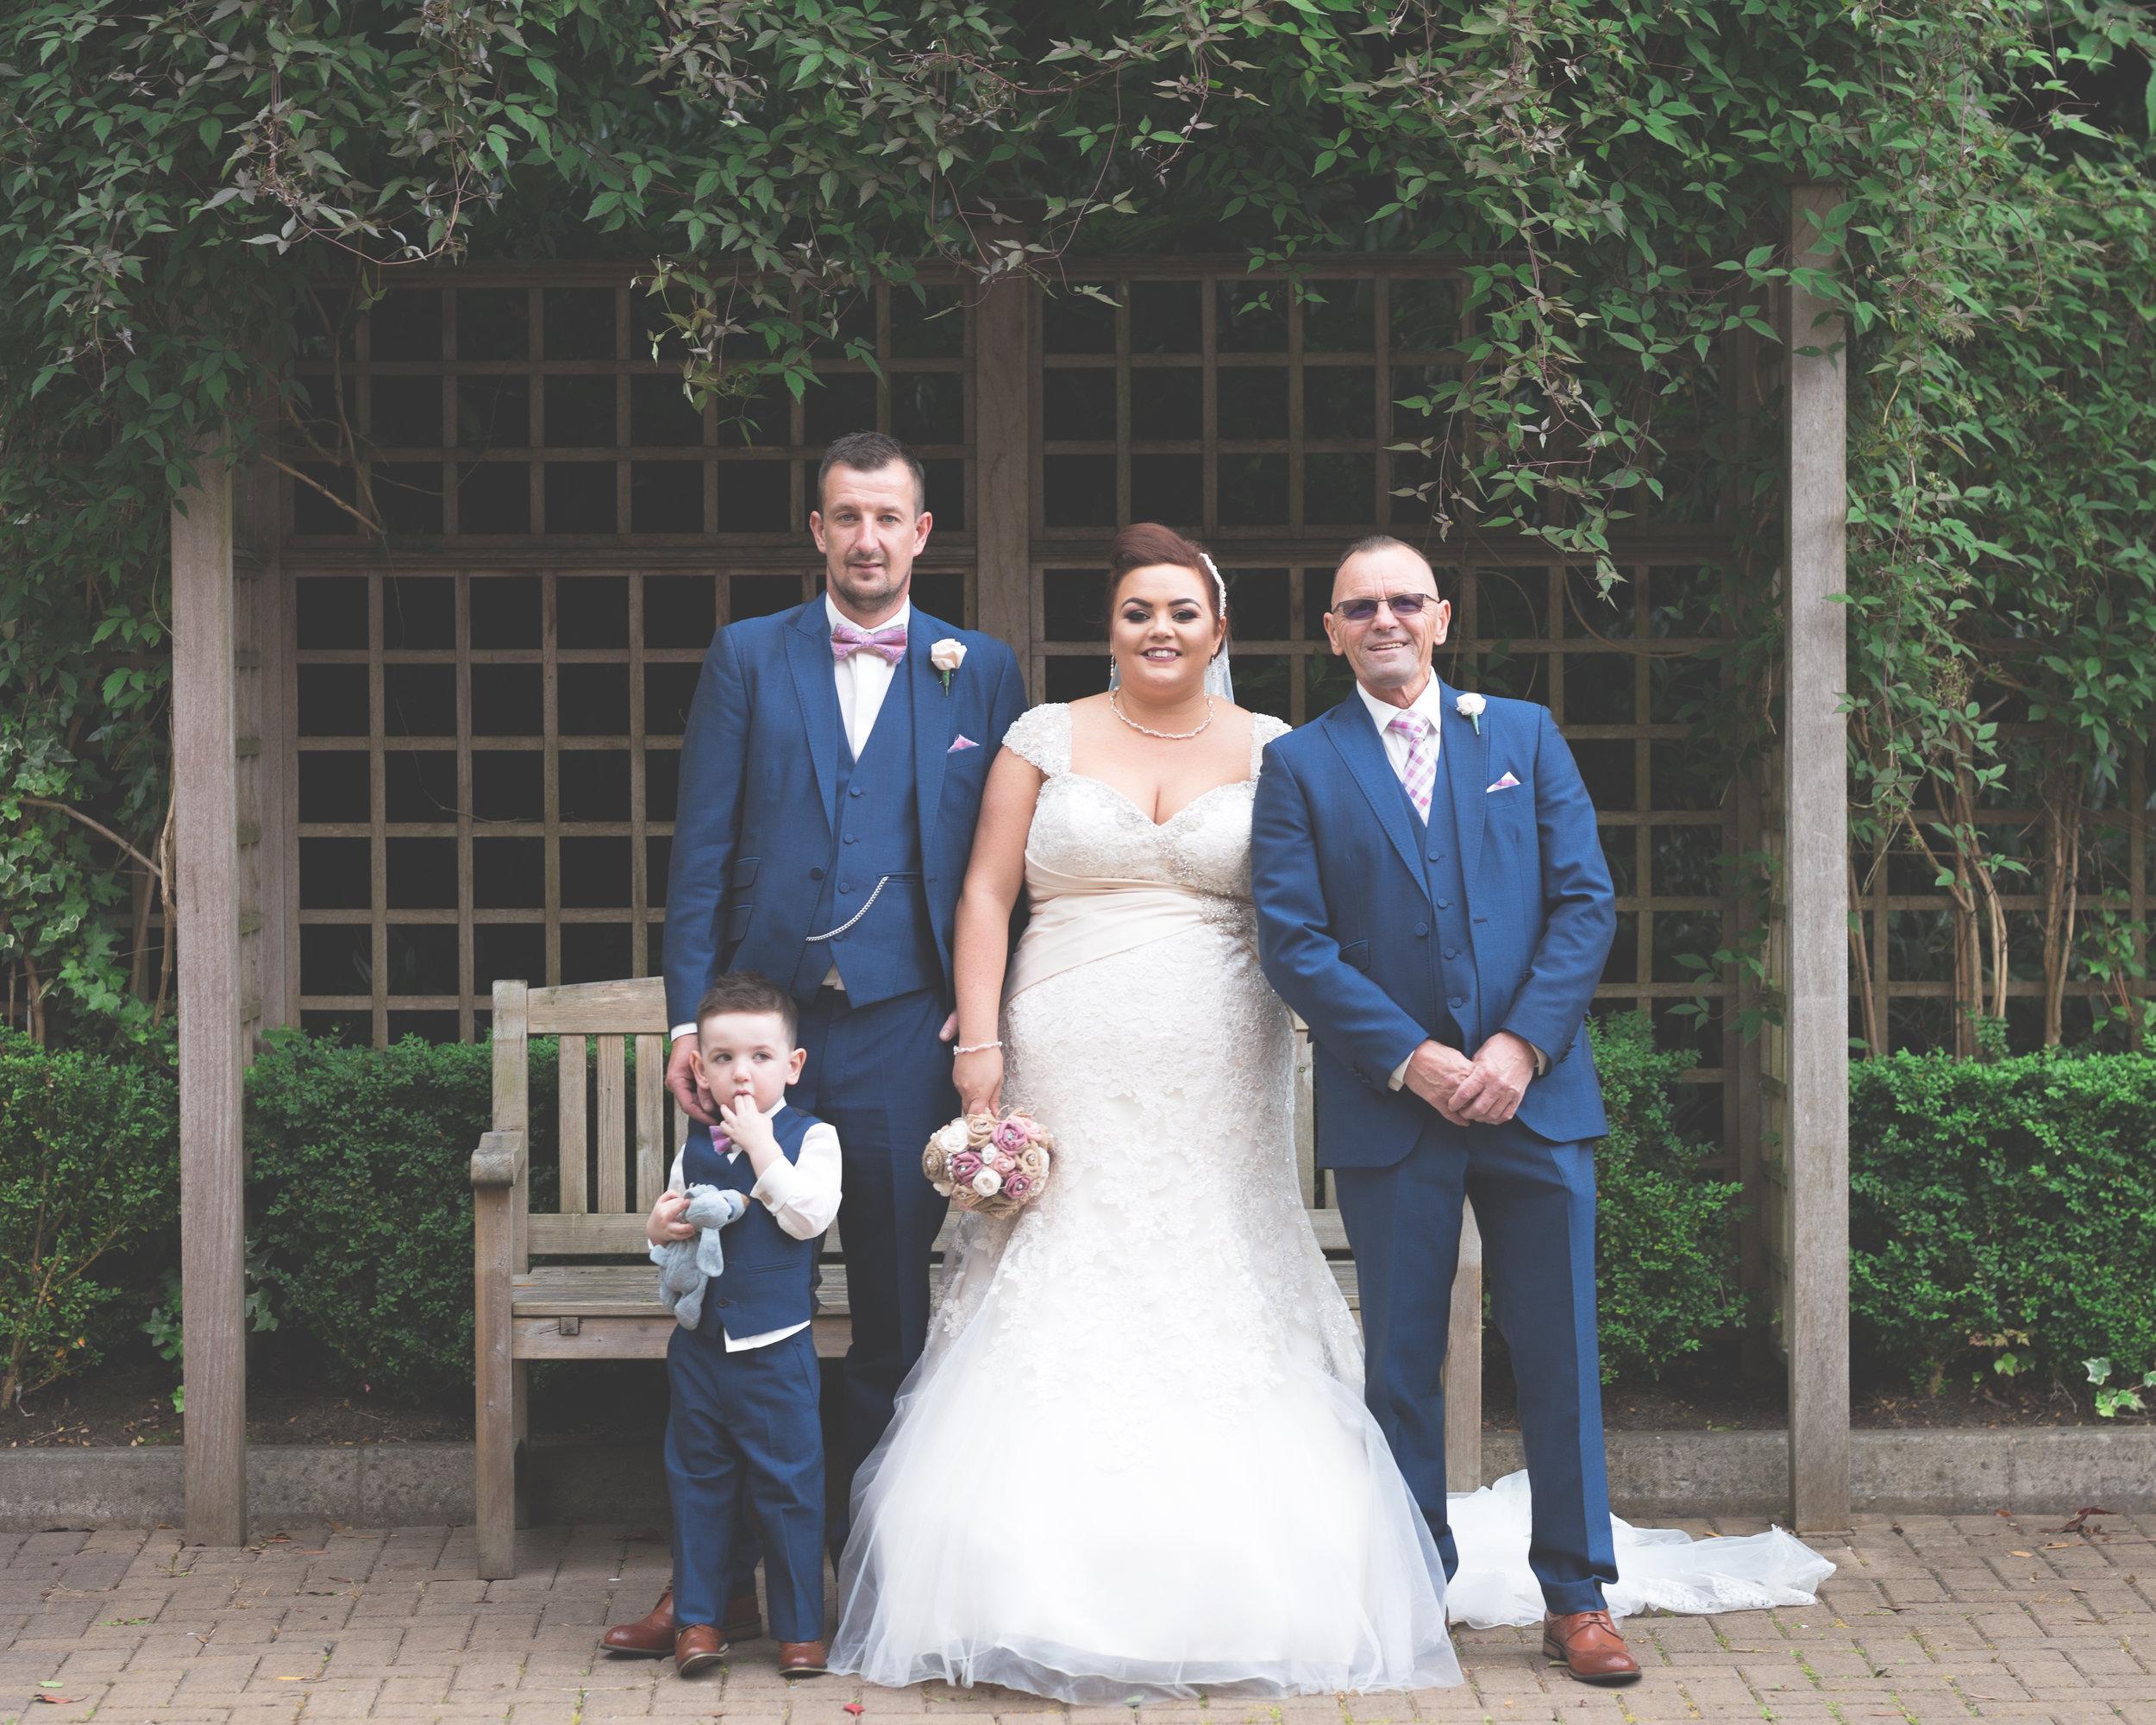 Antoinette & Stephen - Portraits   Brian McEwan Photography   Wedding Photographer Northern Ireland 54.jpg